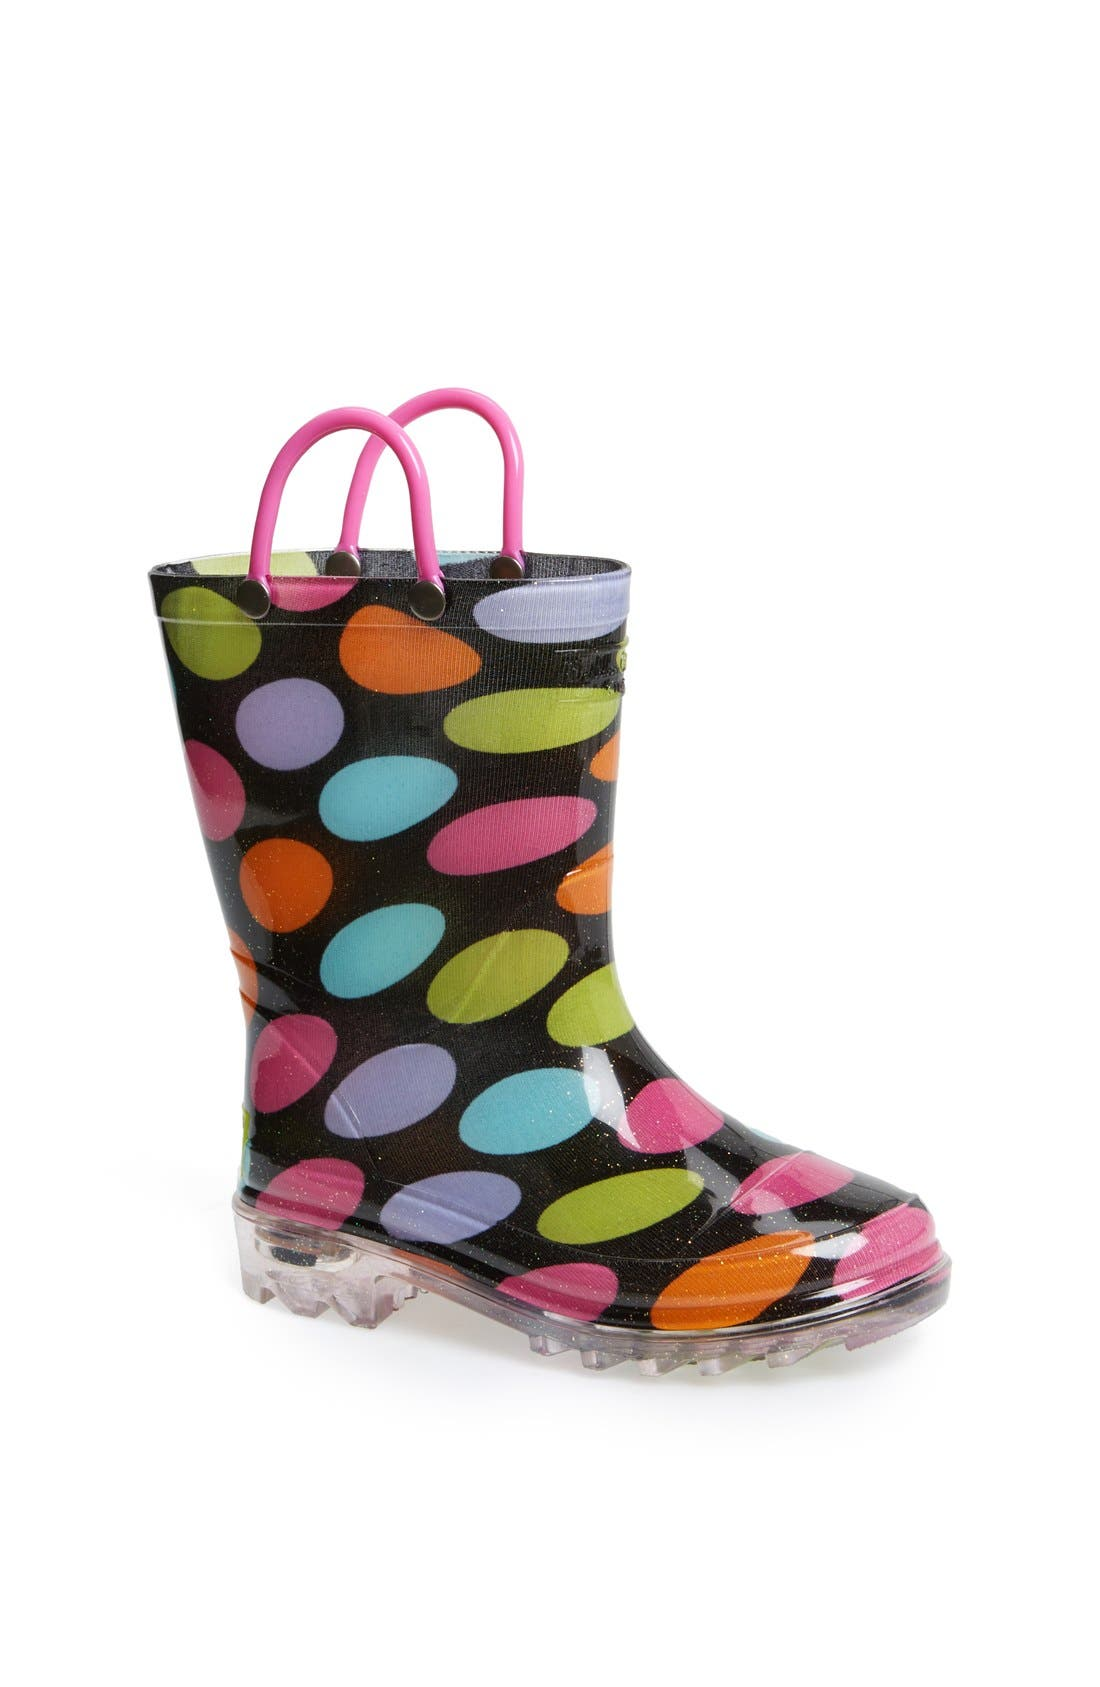 Main Image - Western Chief 'Dotty' Light Up Rain Boot (Toddler & Little Kid)